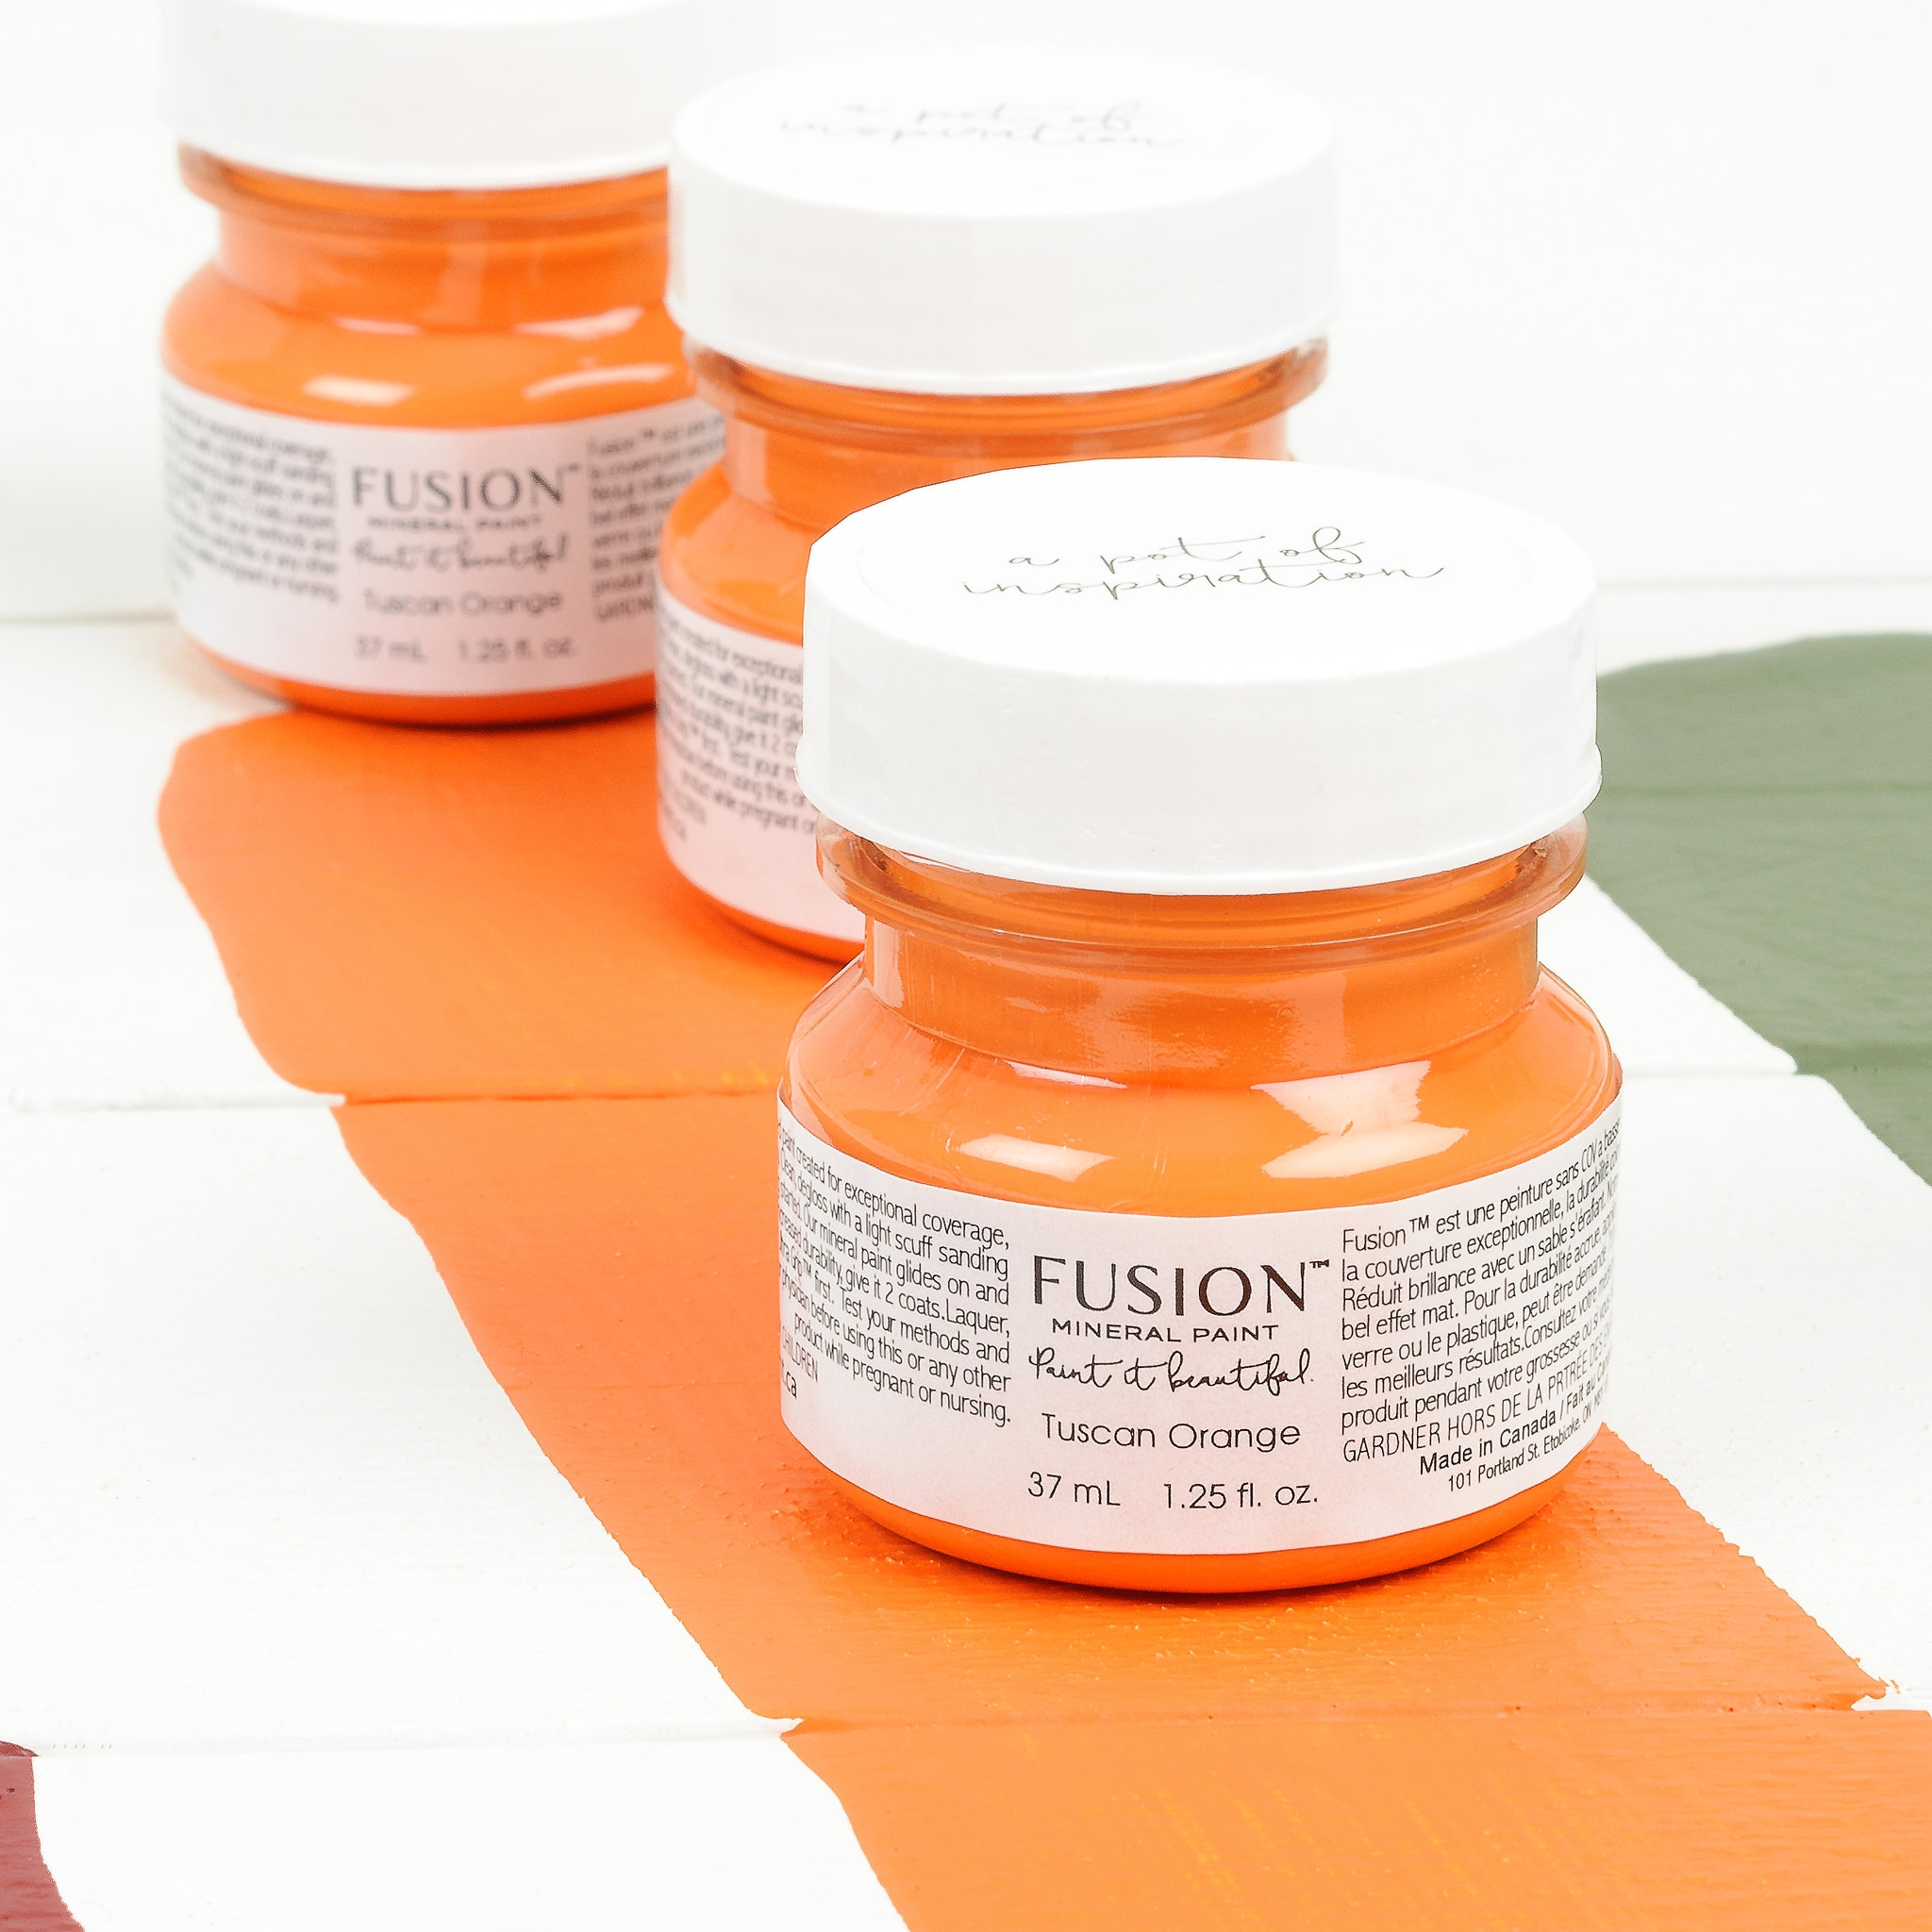 Tuscan Orange Fusion Mineral Paint